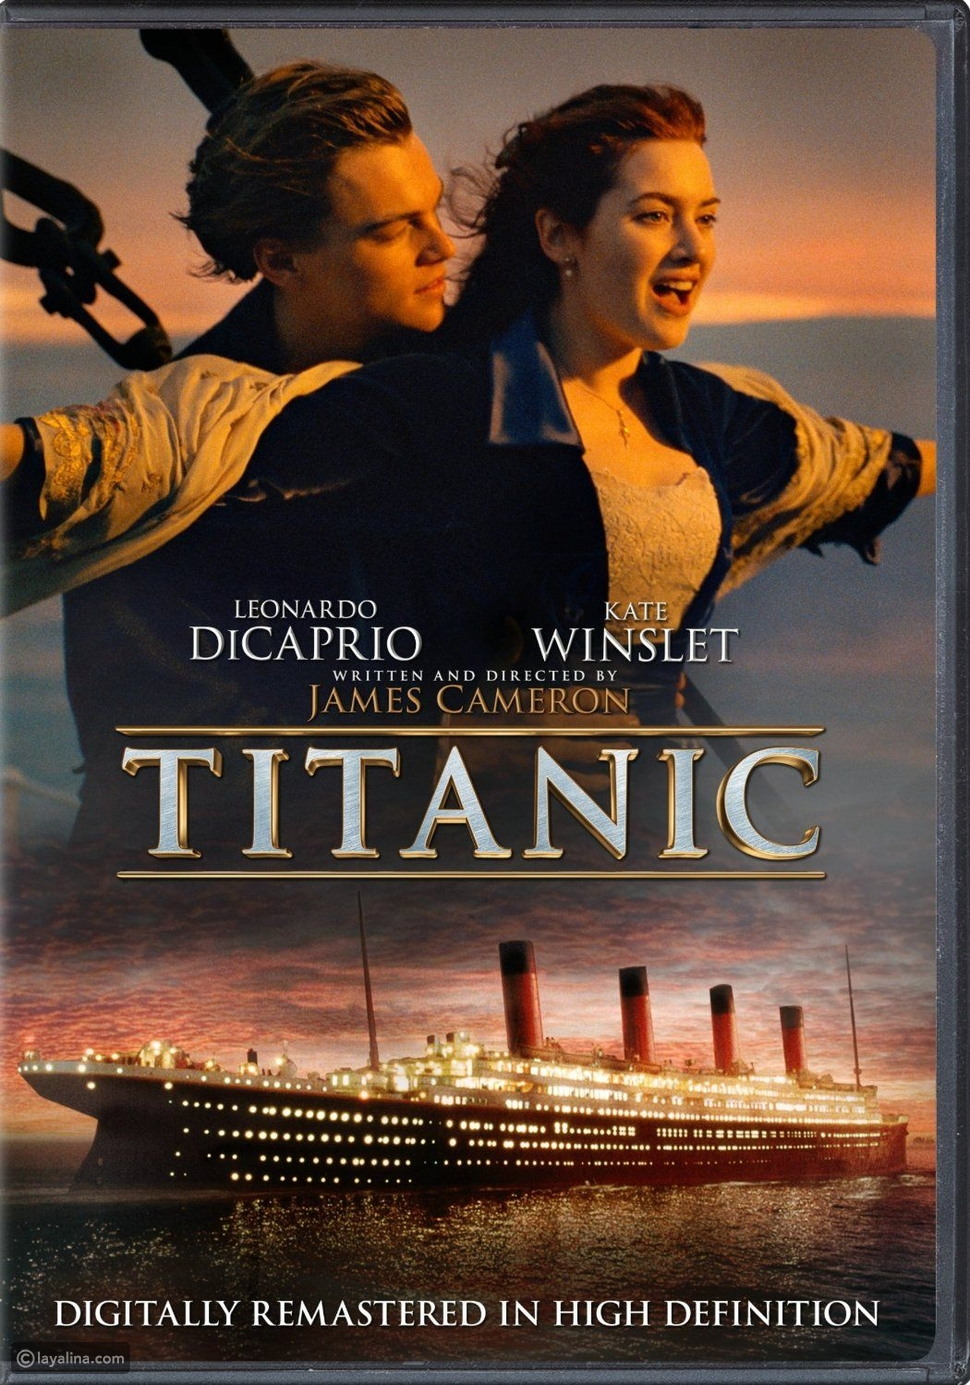 Titanic فيلم رومانسي لسهرة عيد الحب